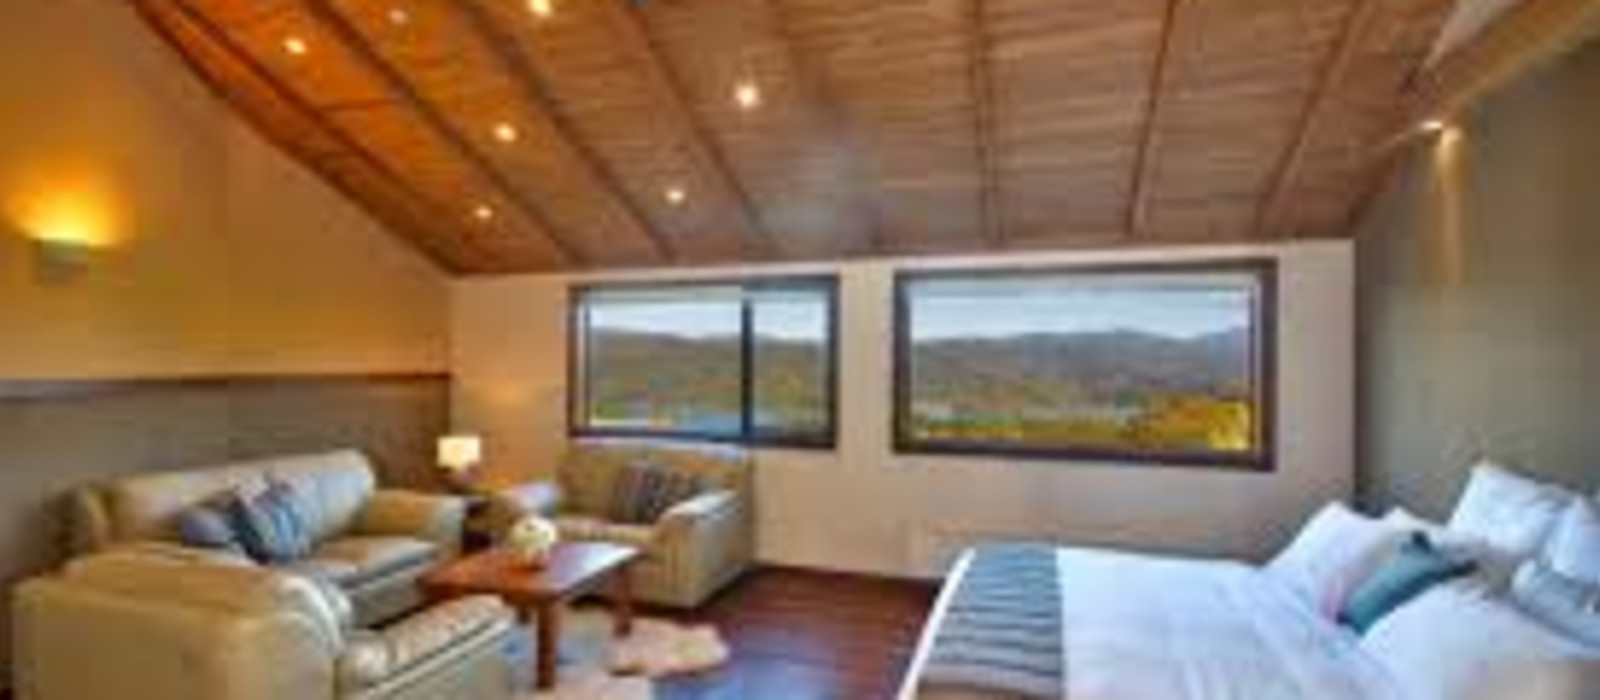 Hotel Westhaven Retreat Luxury Lodge New Zealand